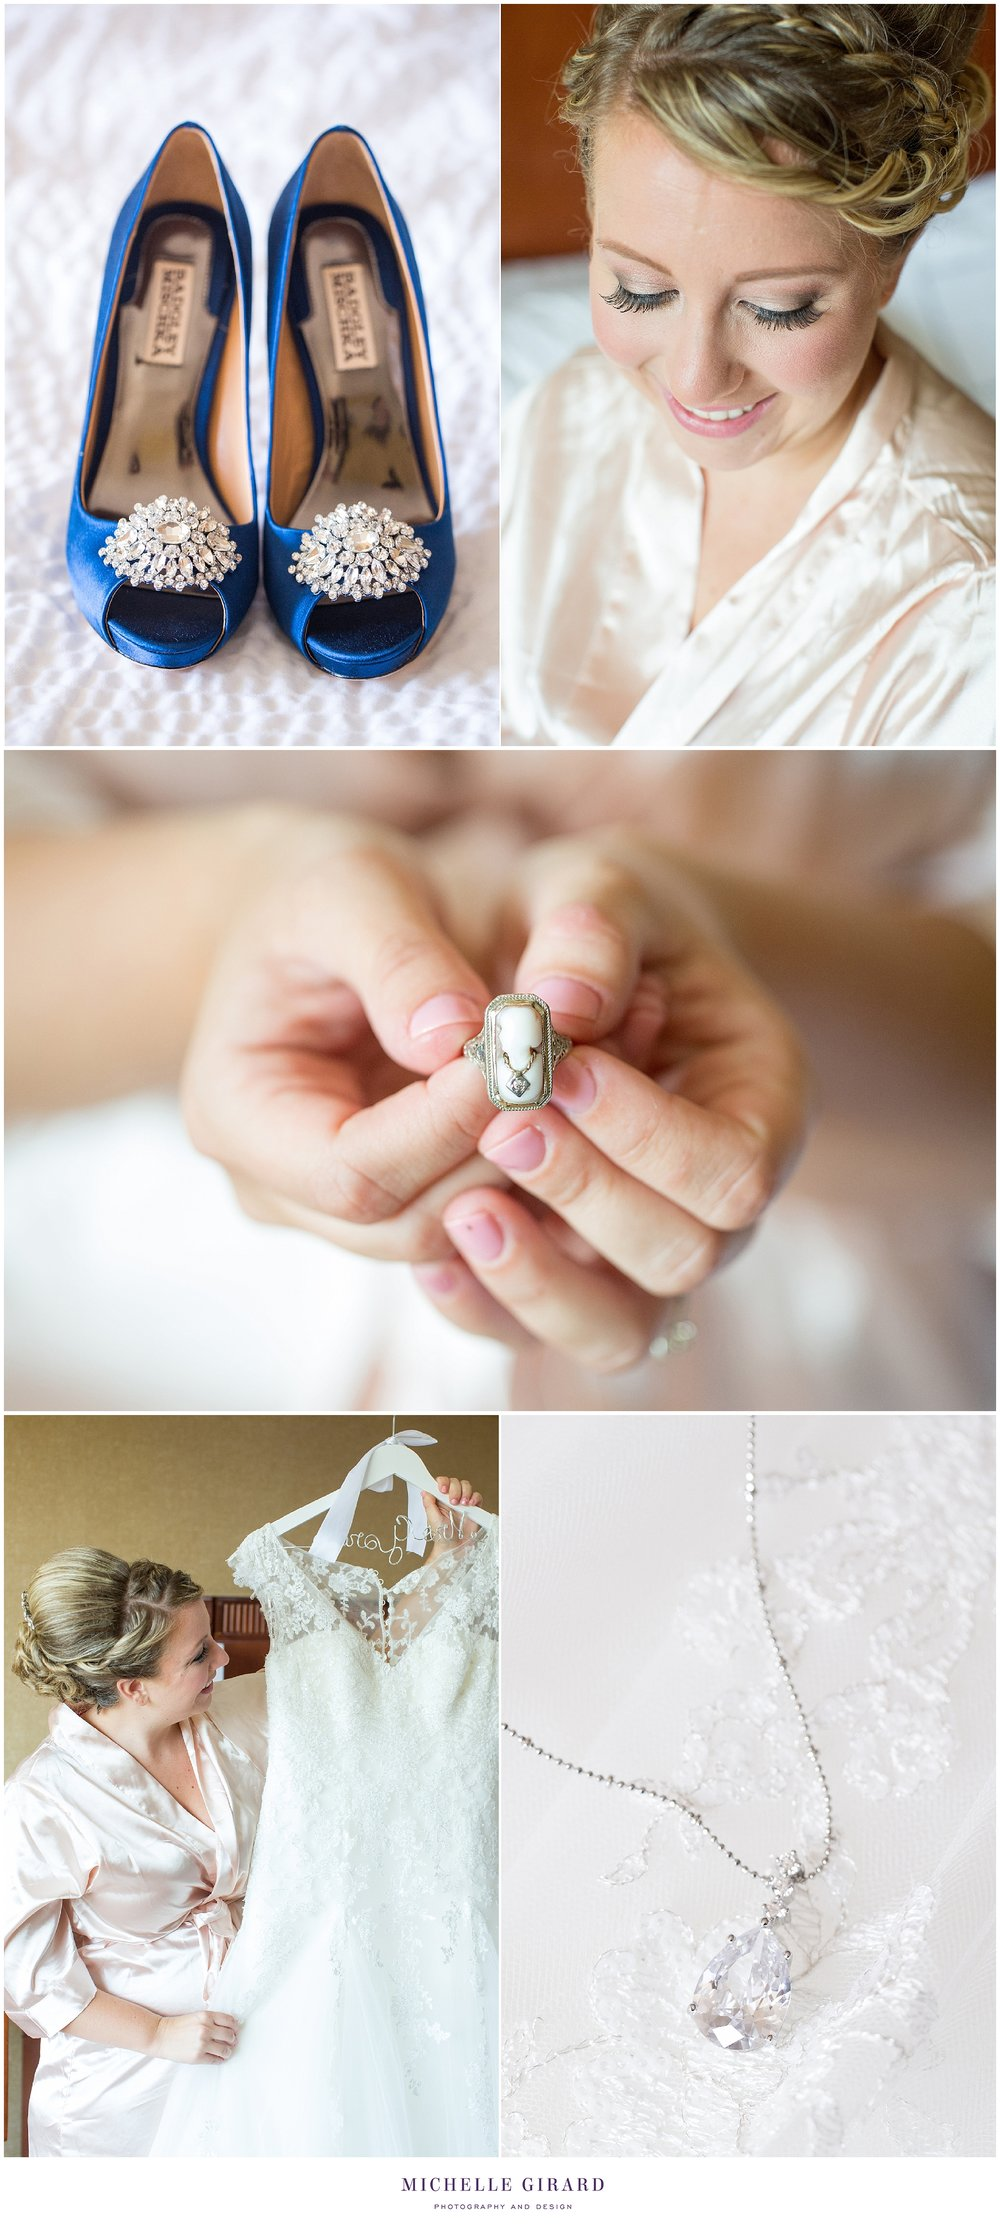 WeddingGettingReadyPhotography_ClassicSummerWedding_MichelleGirardPhotography1.jpg